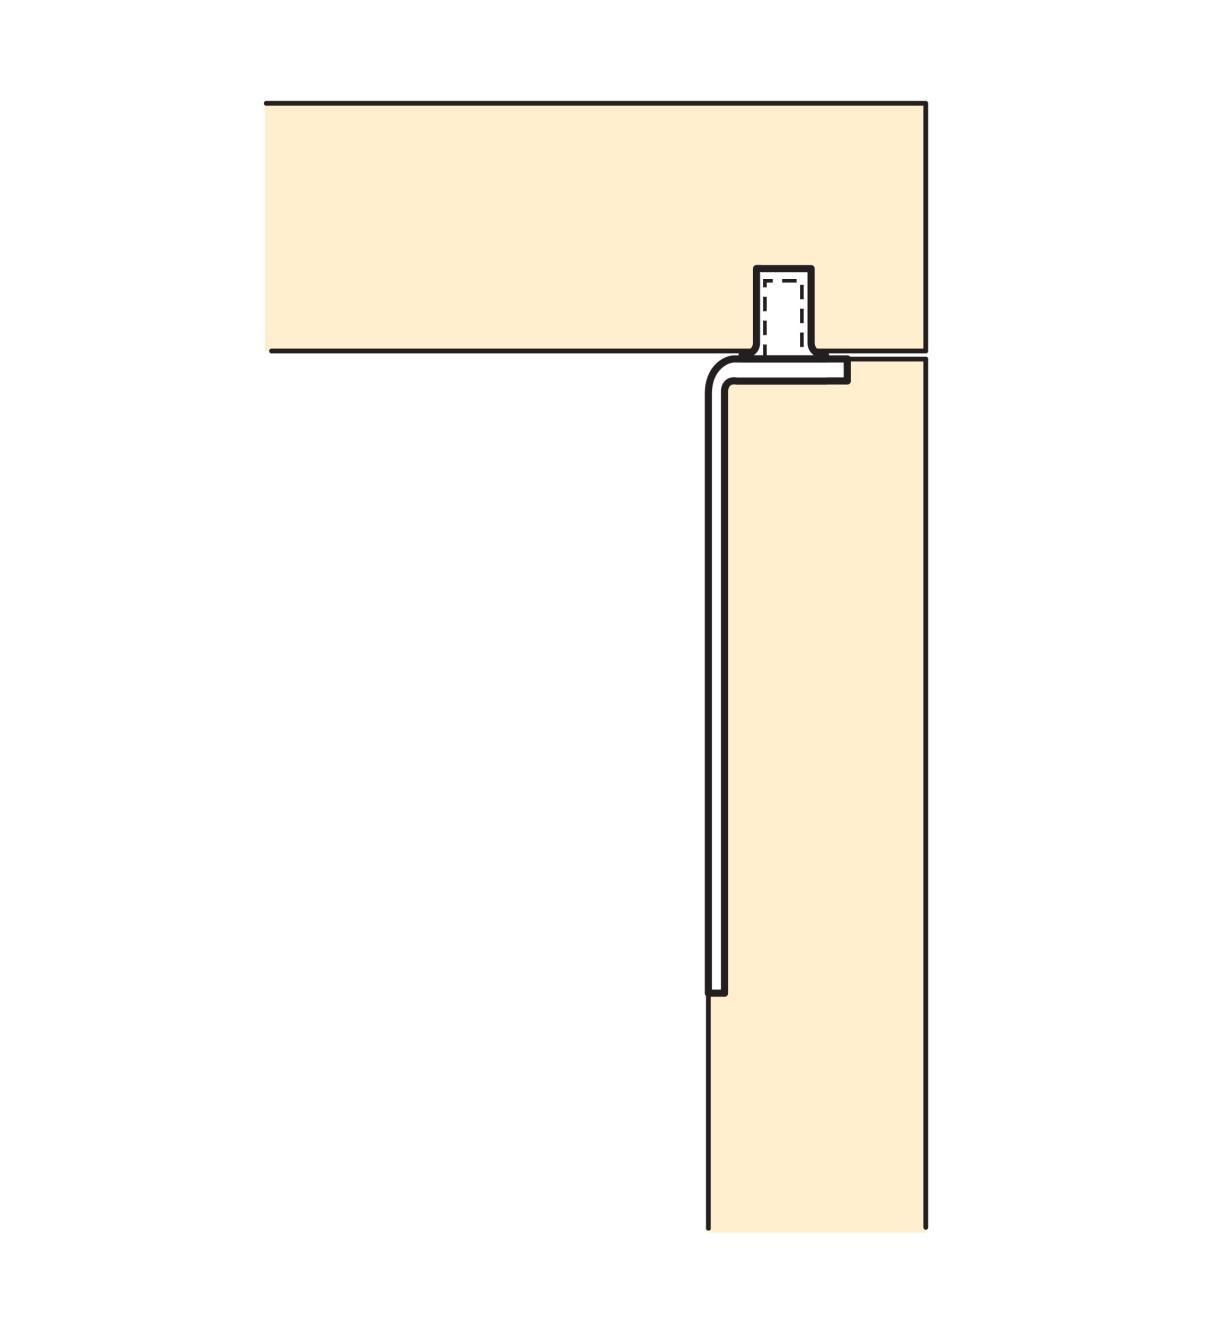 00H0312 - Rear Pivot Hinges, pr.